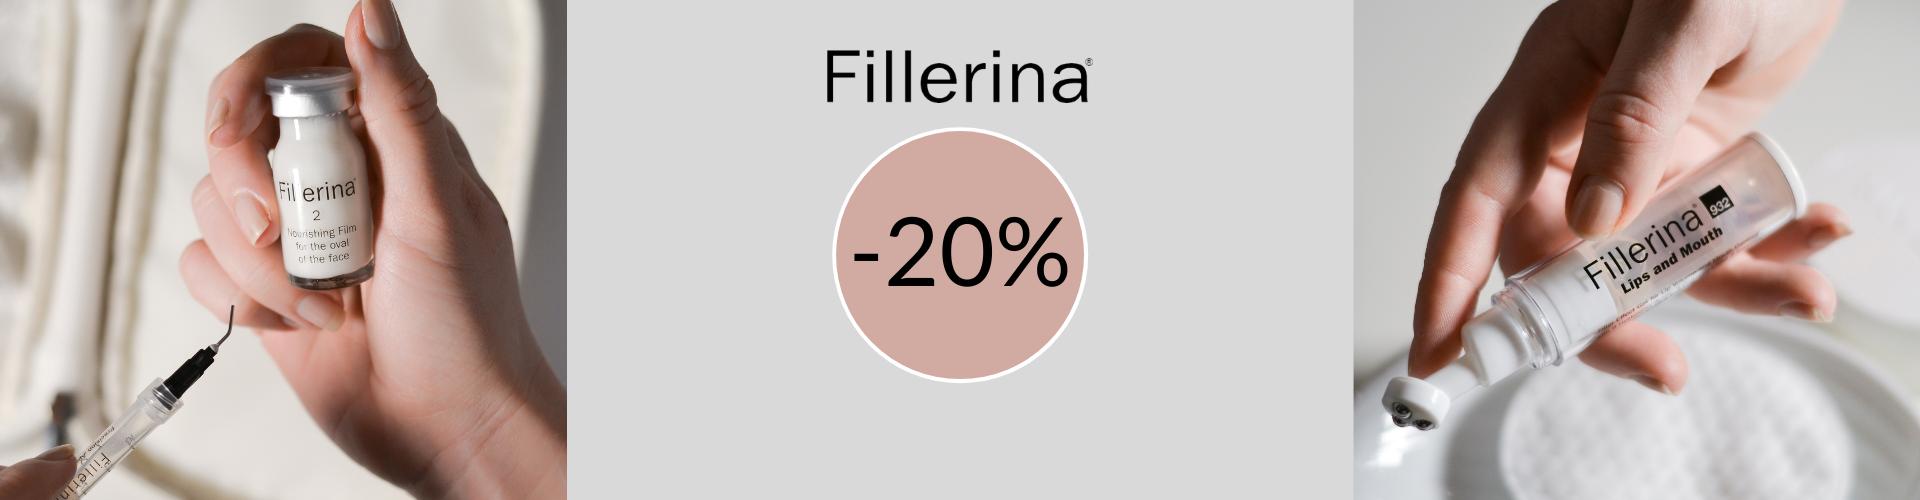 Fillerina -20% lokakuu 2021